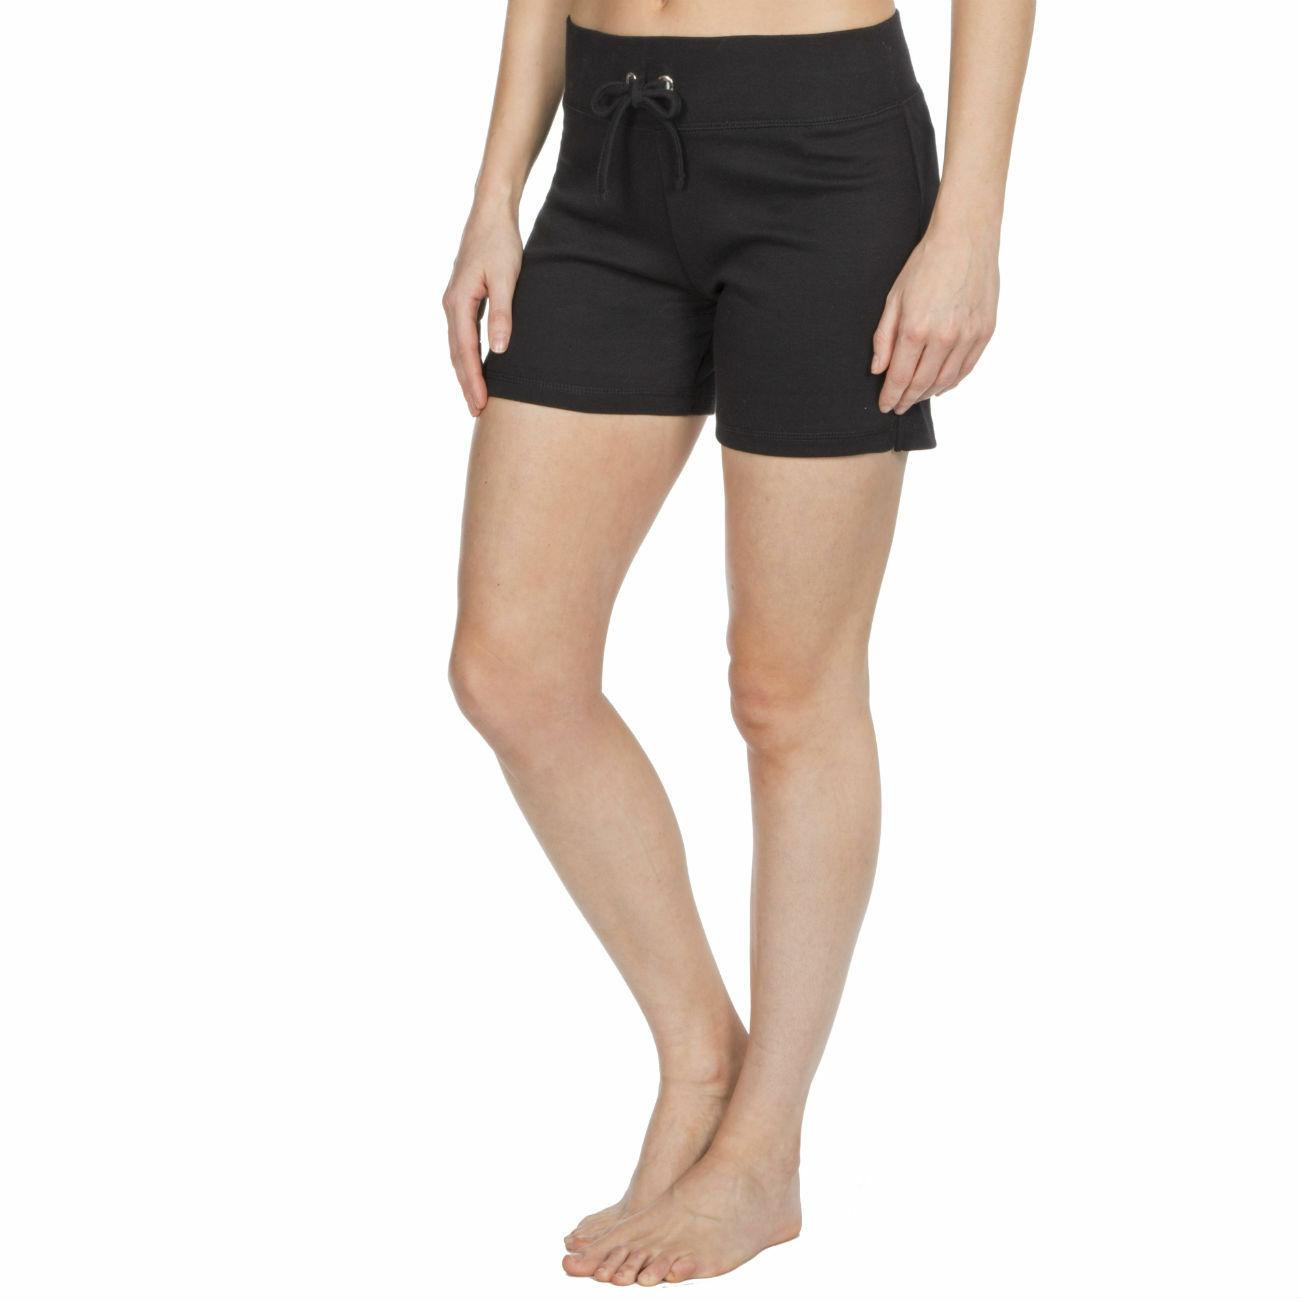 Womens-Cotton-Jersey-Shorts-Elastic-Waist-Summer-Beach-Casual-Yoga-Hot-Pants-New thumbnail 4